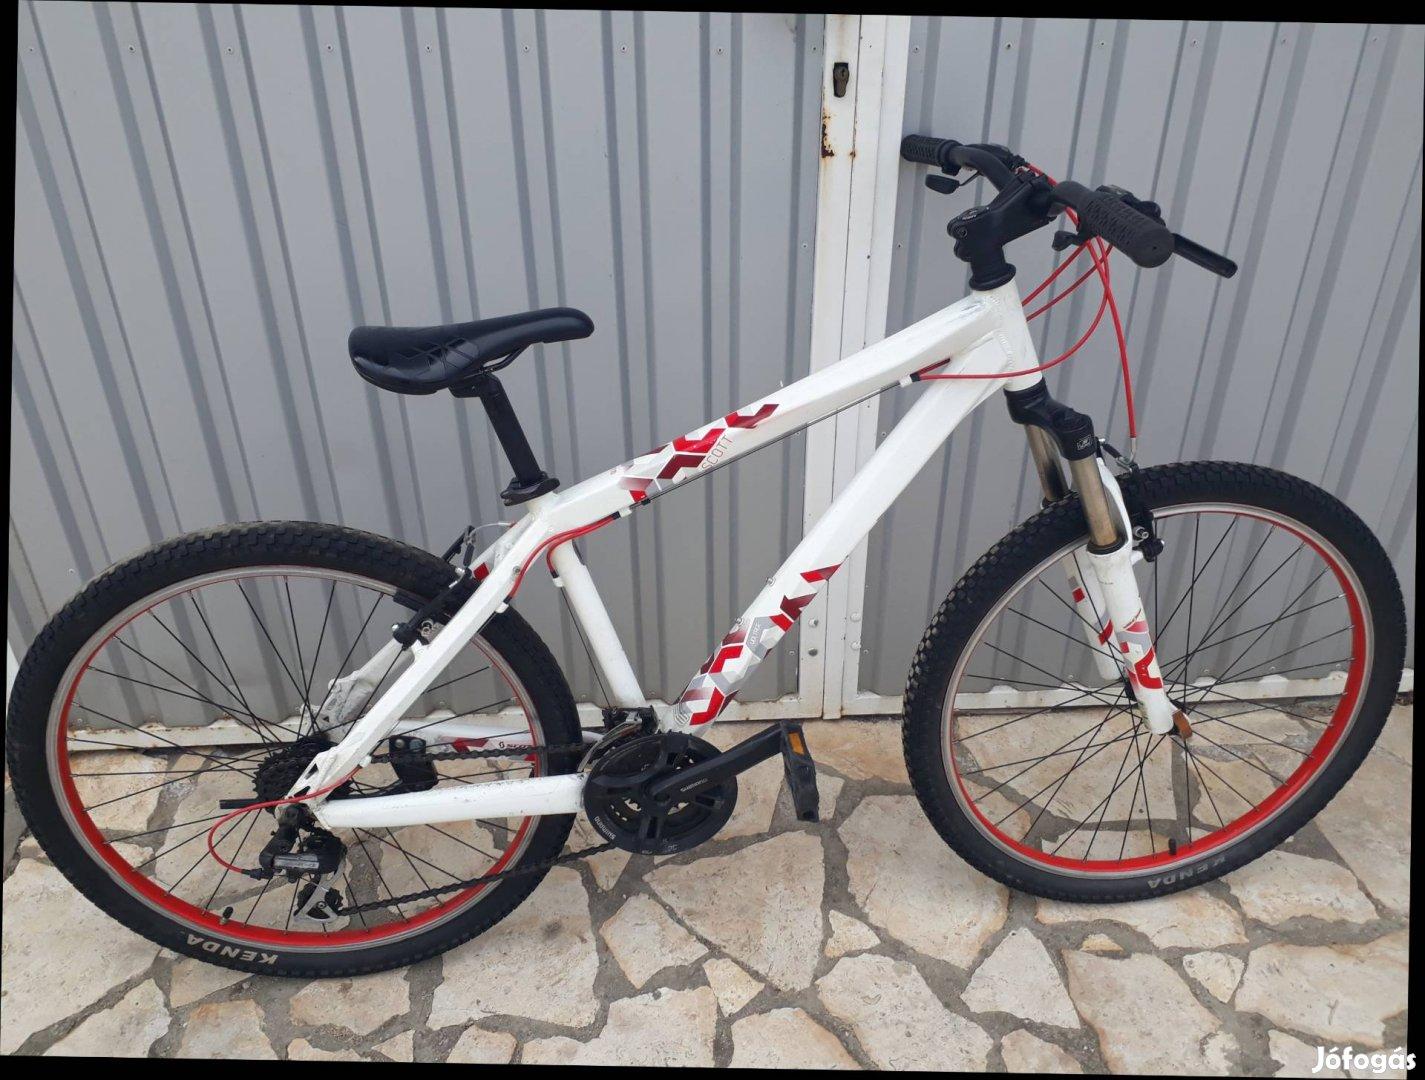 Eladó scott biciklim, 1. Kép